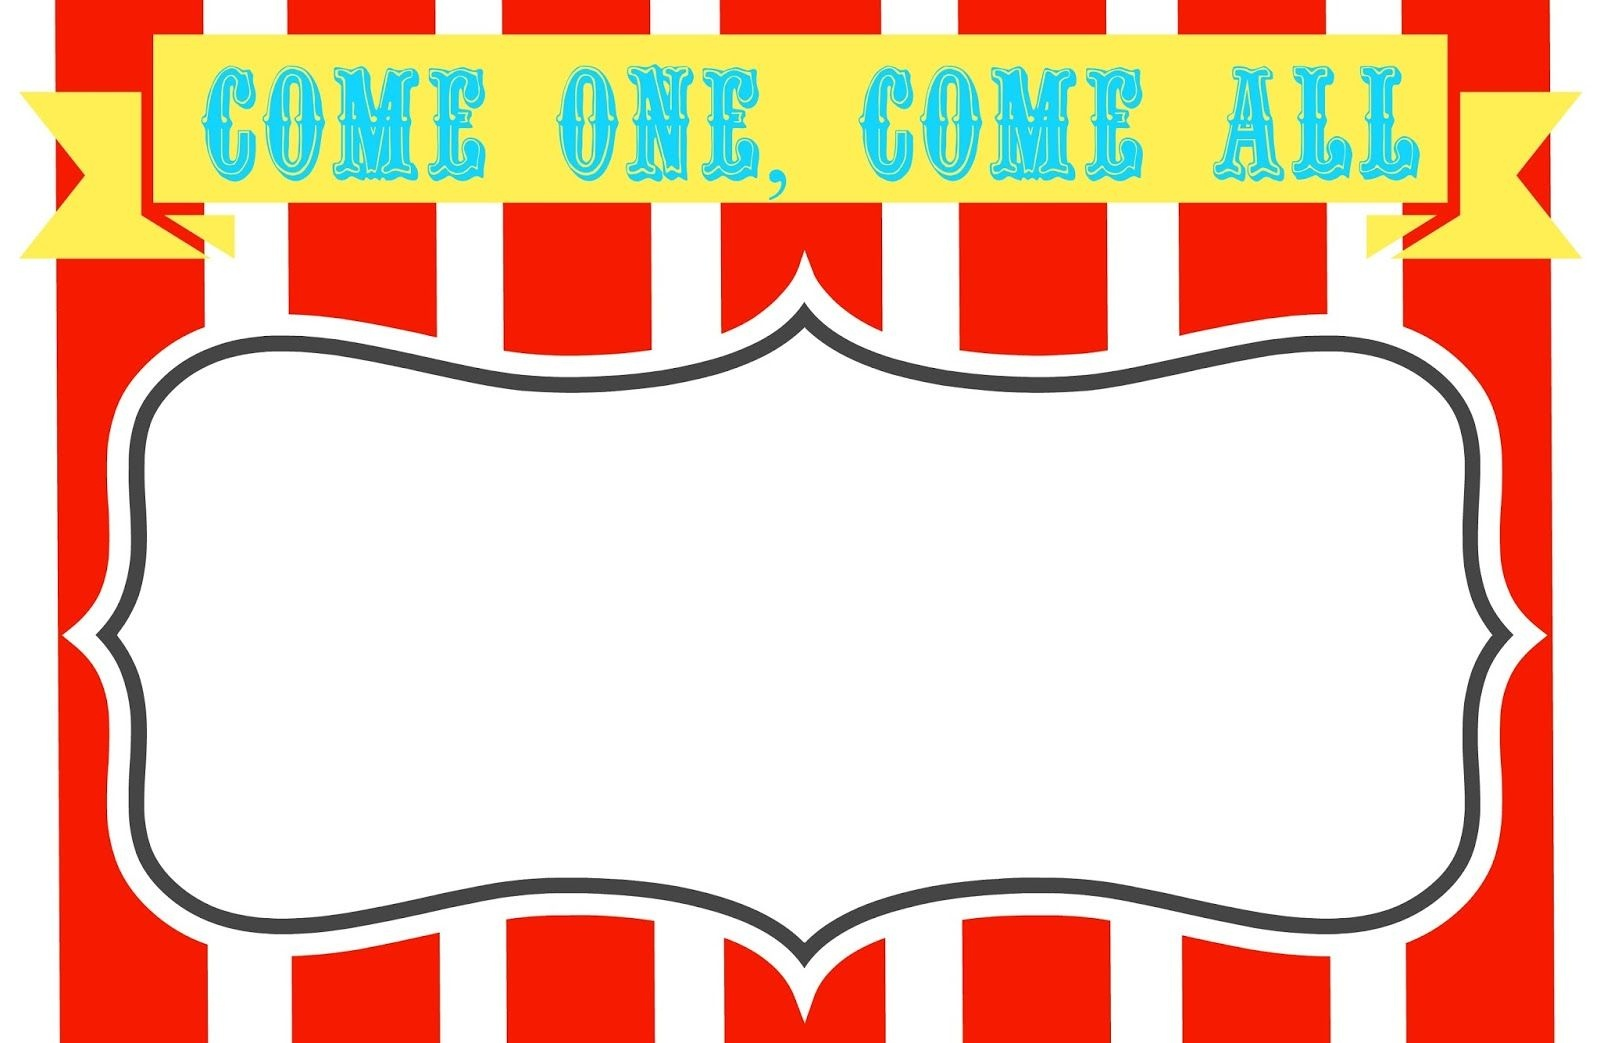 Free Printable Carnival Themed Invitations | Paper Crafting - Free Printable Carnival Signs